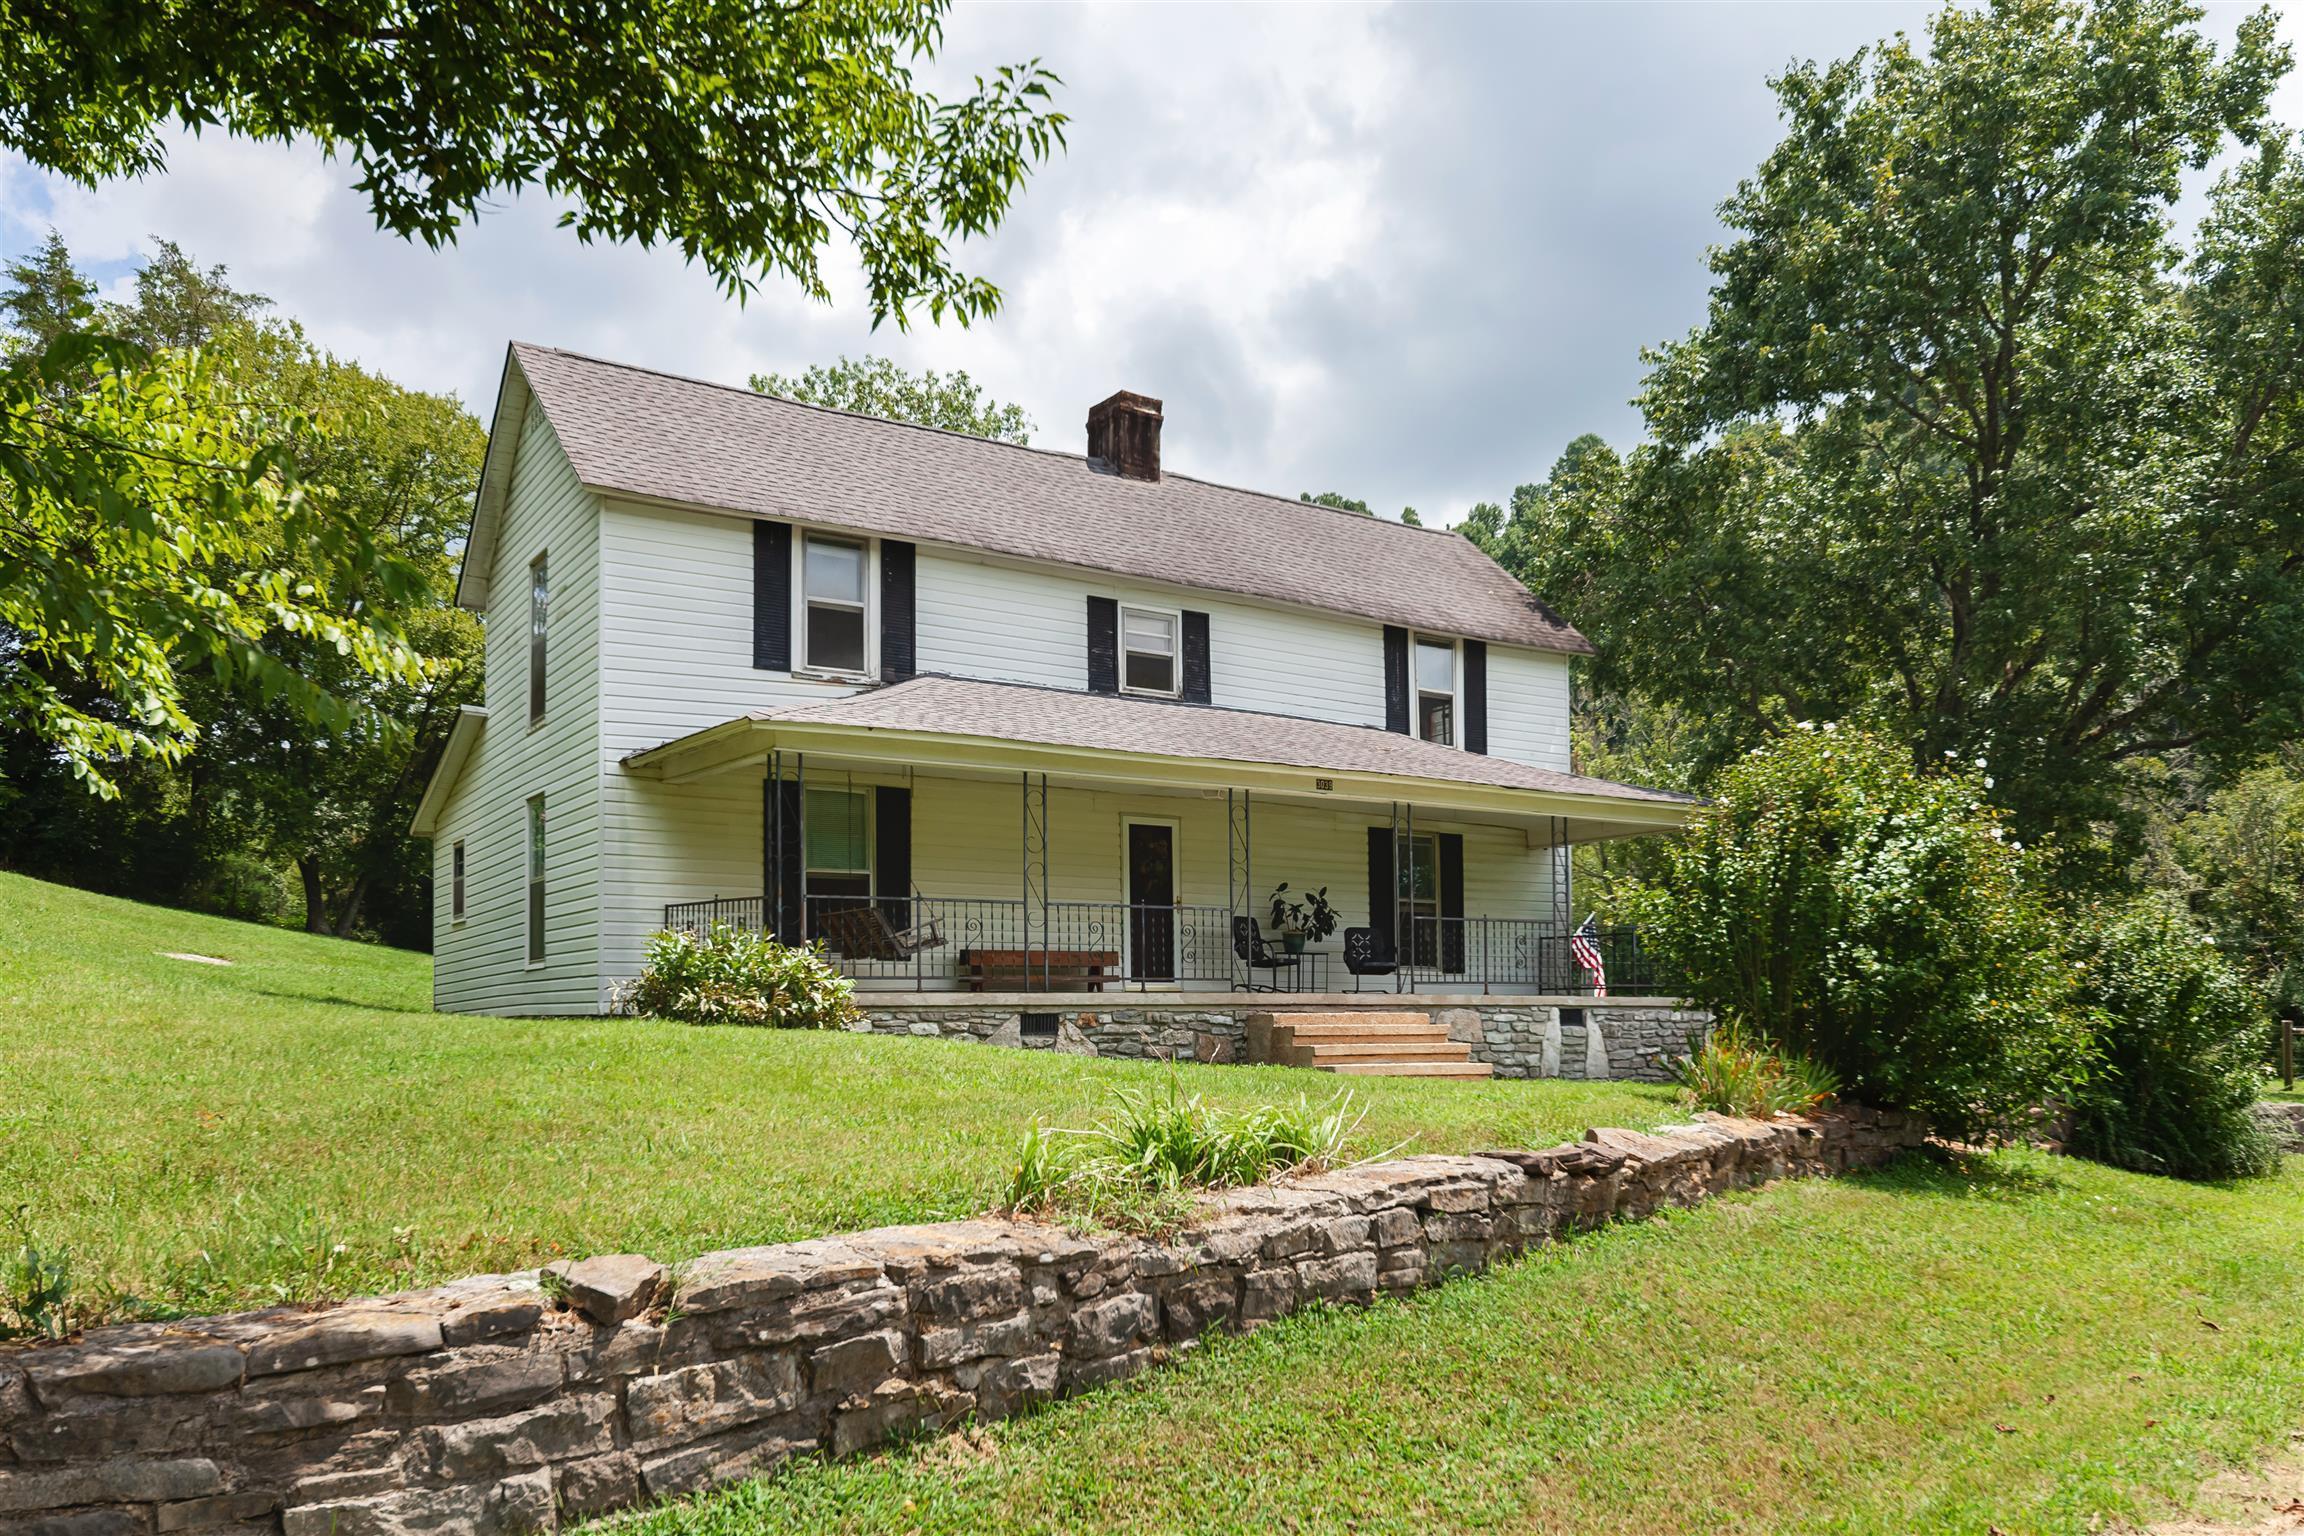 3039 Pigg Hollow Rd, Petersburg, TN 37144 - Petersburg, TN real estate listing